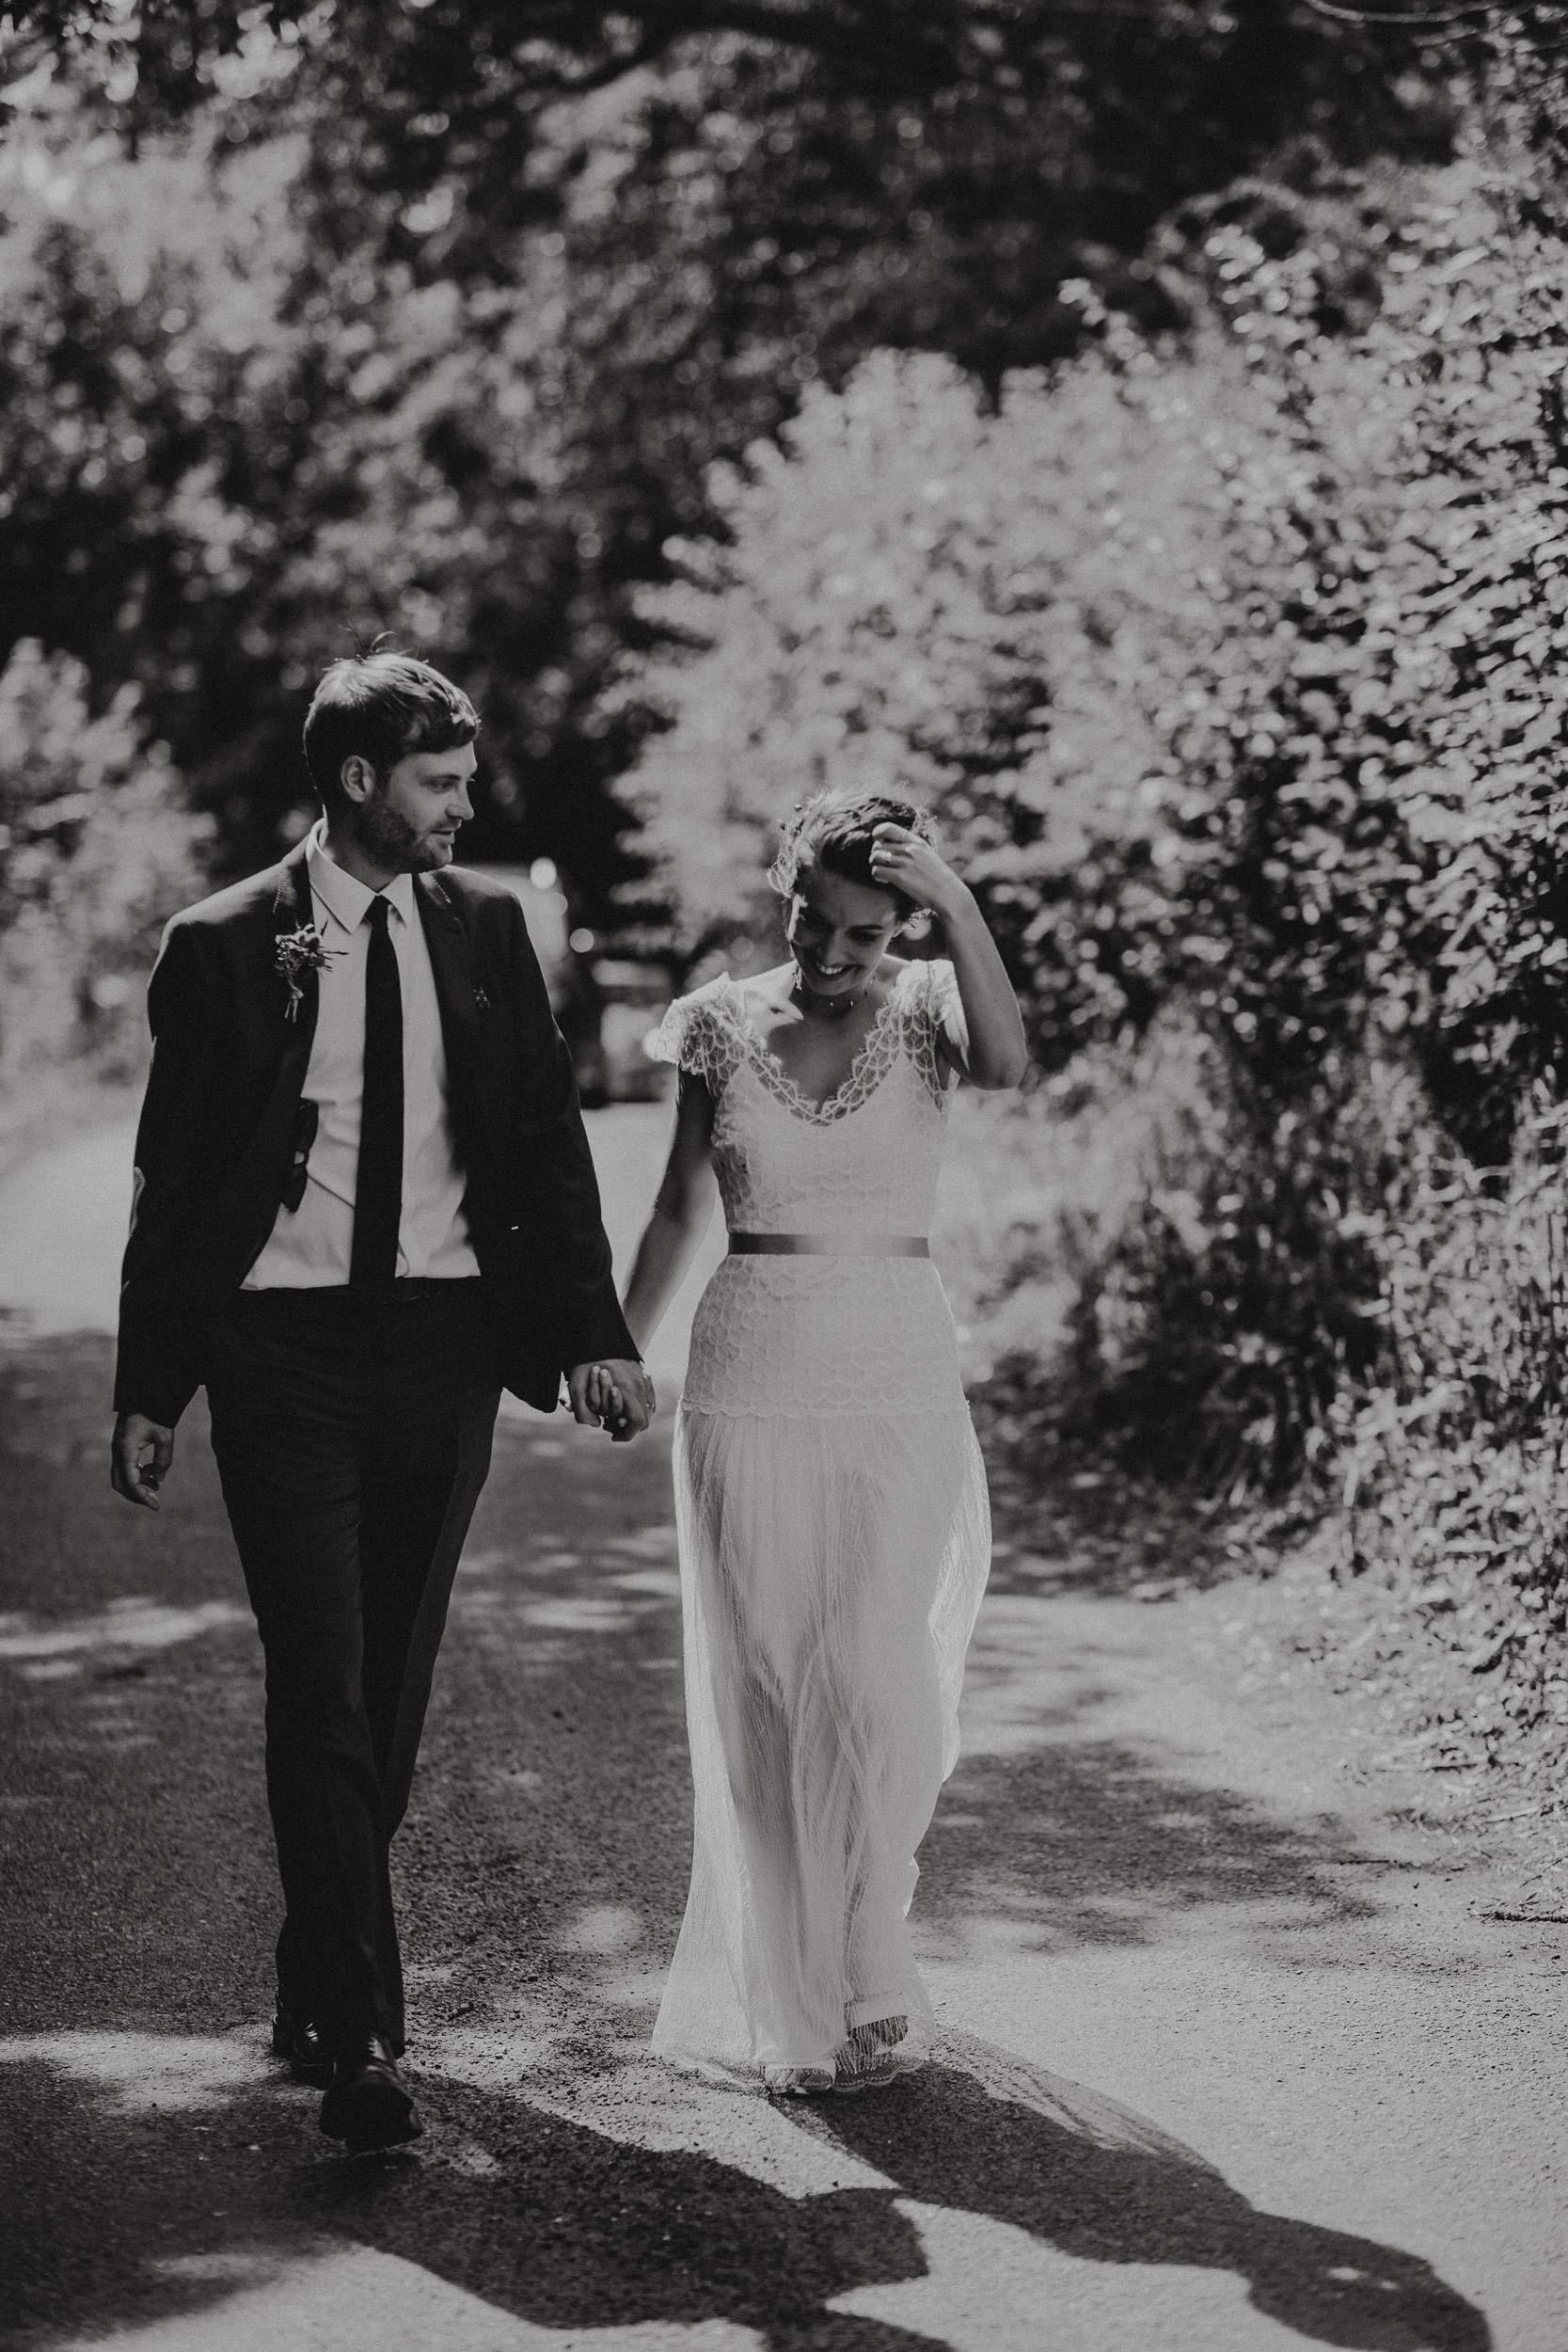 Martha-Laid-Back-Garden-Wedding-Lace-Wedding-Dress-Bohemian-Kate-Beaumont-32.jpg